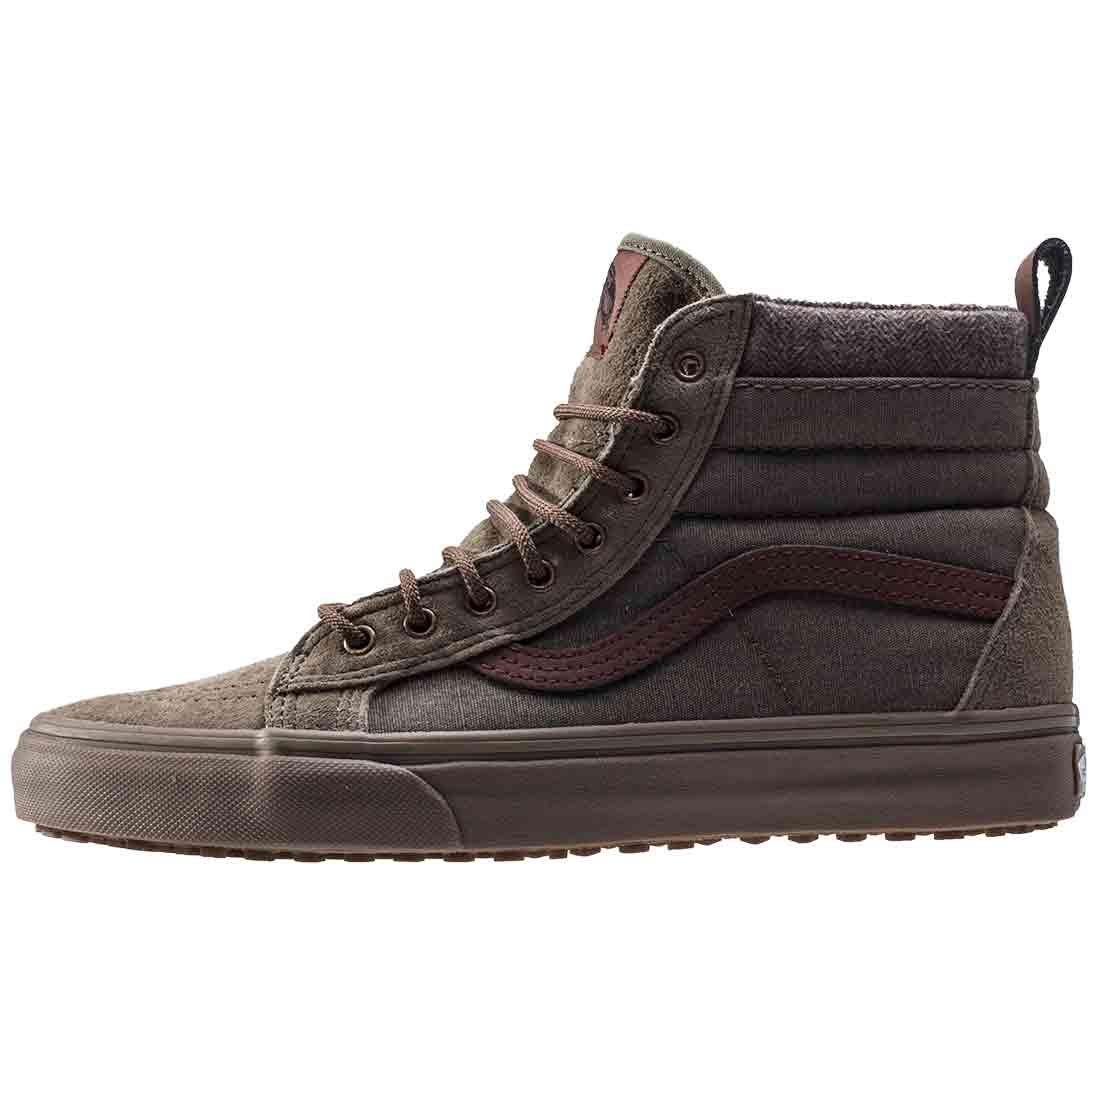 1340b6203a Vans Winter Boot Men Sk8-Hi MTE Dx Sneakers  Amazon.co.uk  Shoes   Bags